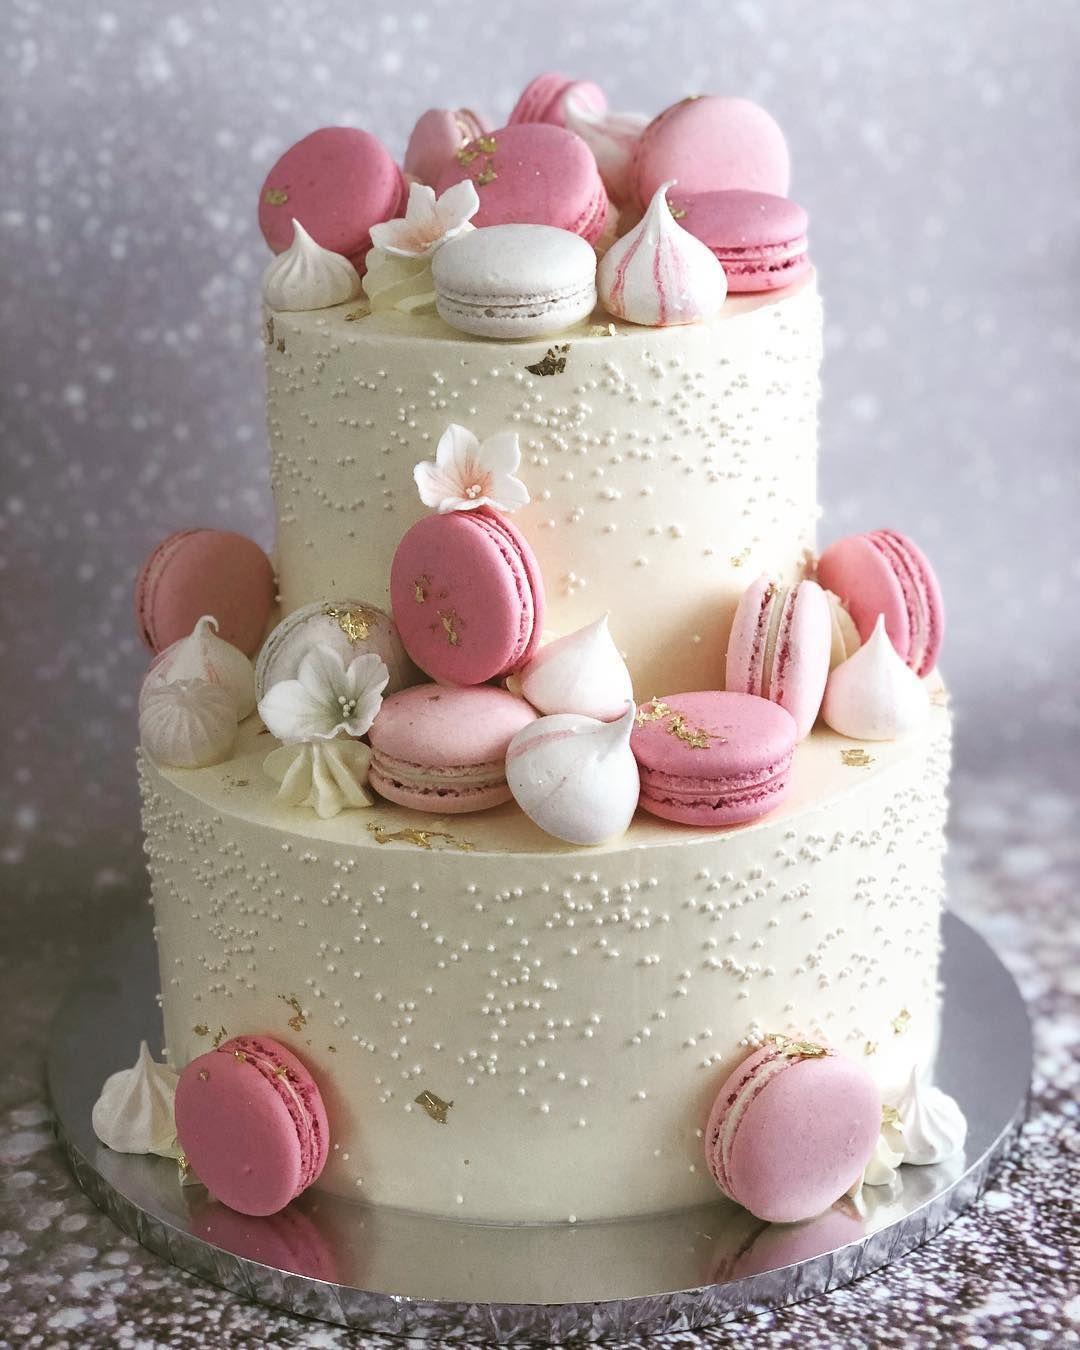 Happy 21st Cake For Holly Pretty Pinks Always A Winner Birthday